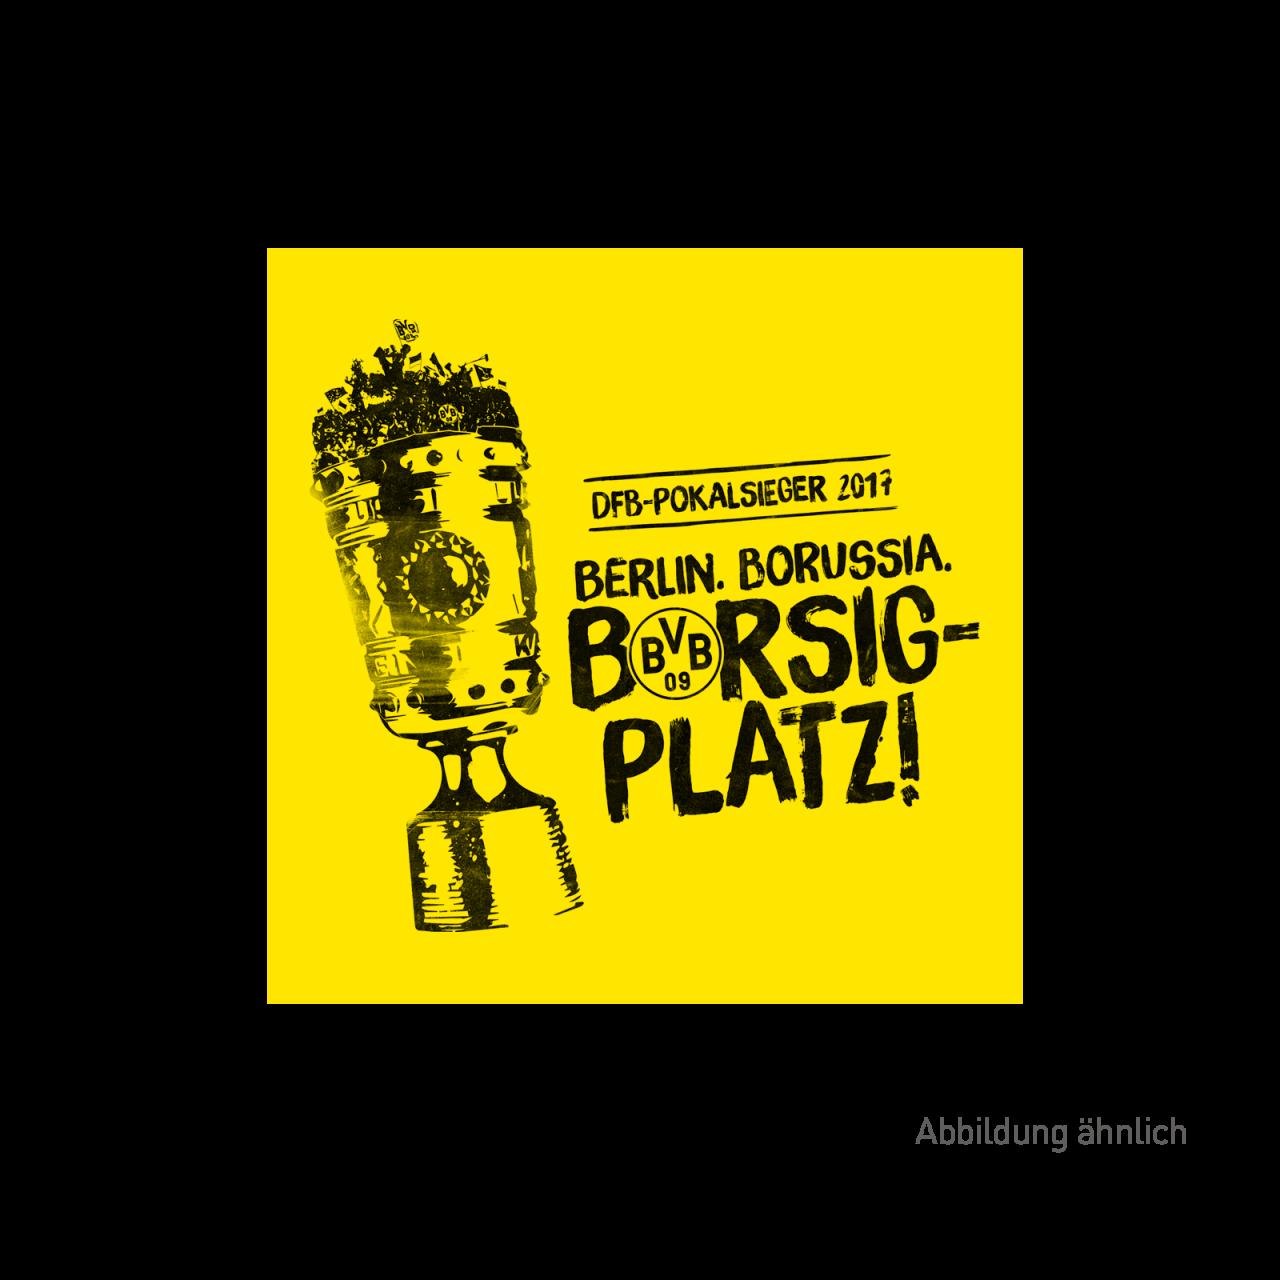 BVB-Aufkleber zum DFB-Pokalsieg 2017